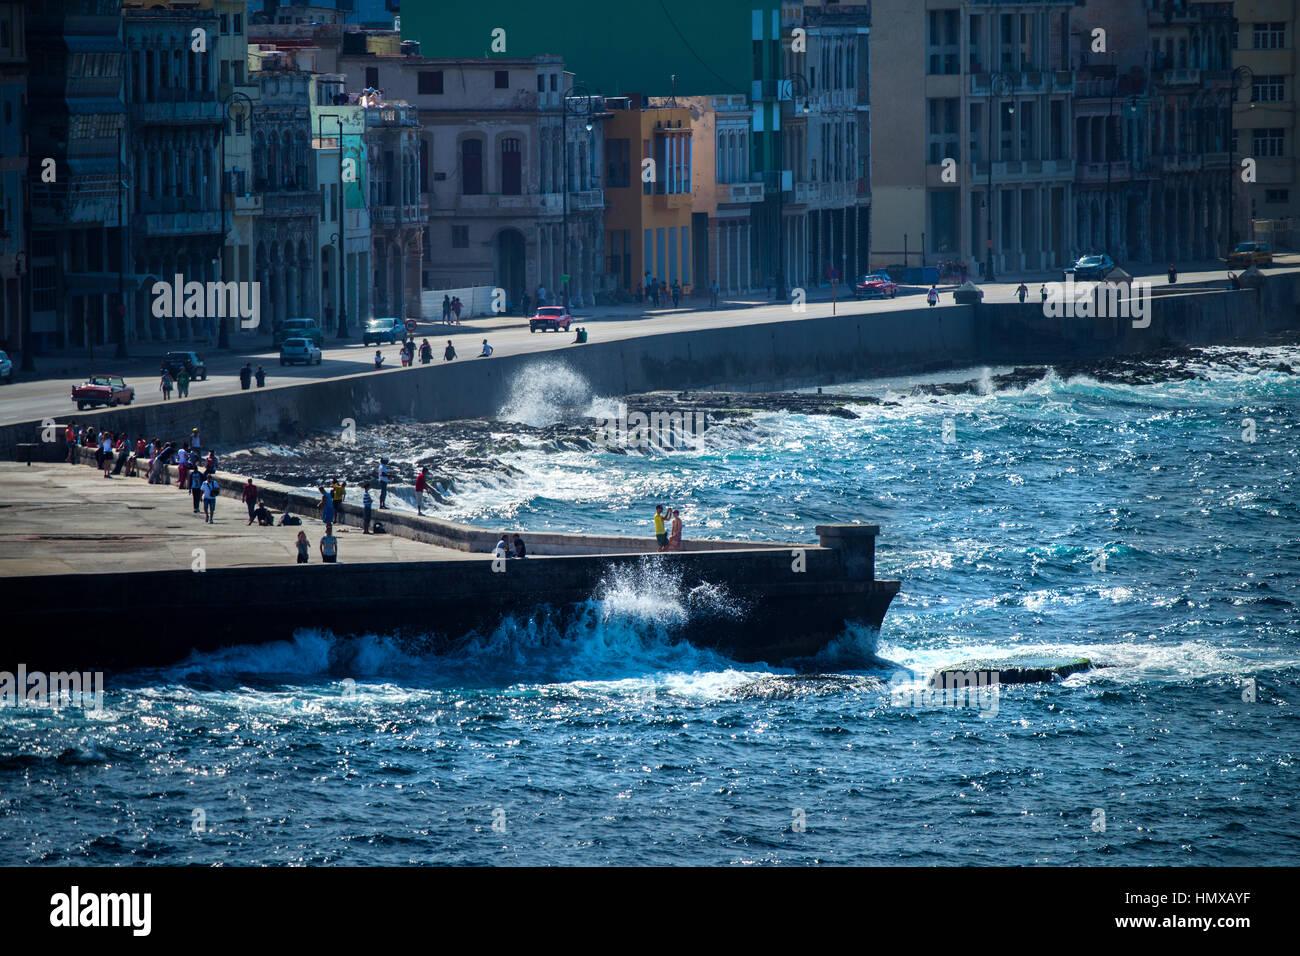 Cuba Havana Malecon - Stock Image